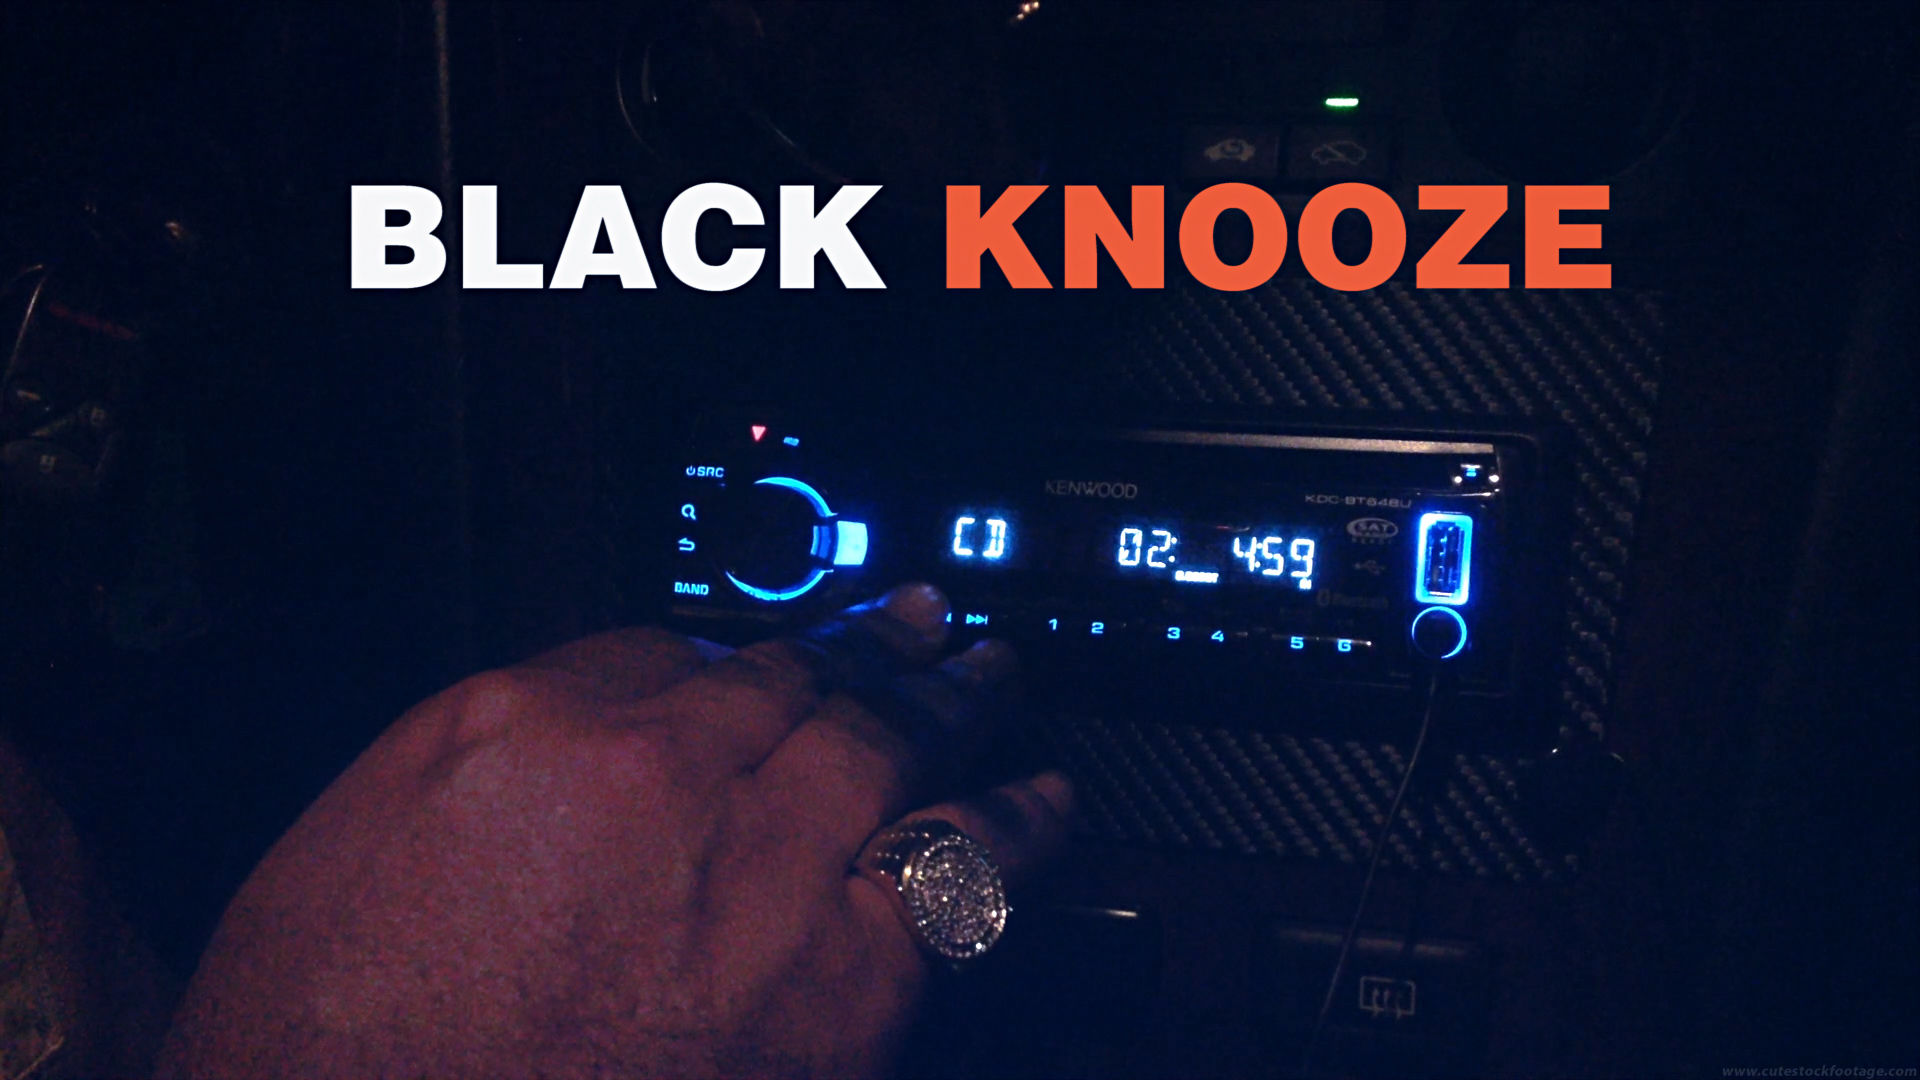 Black Knooze-Black News